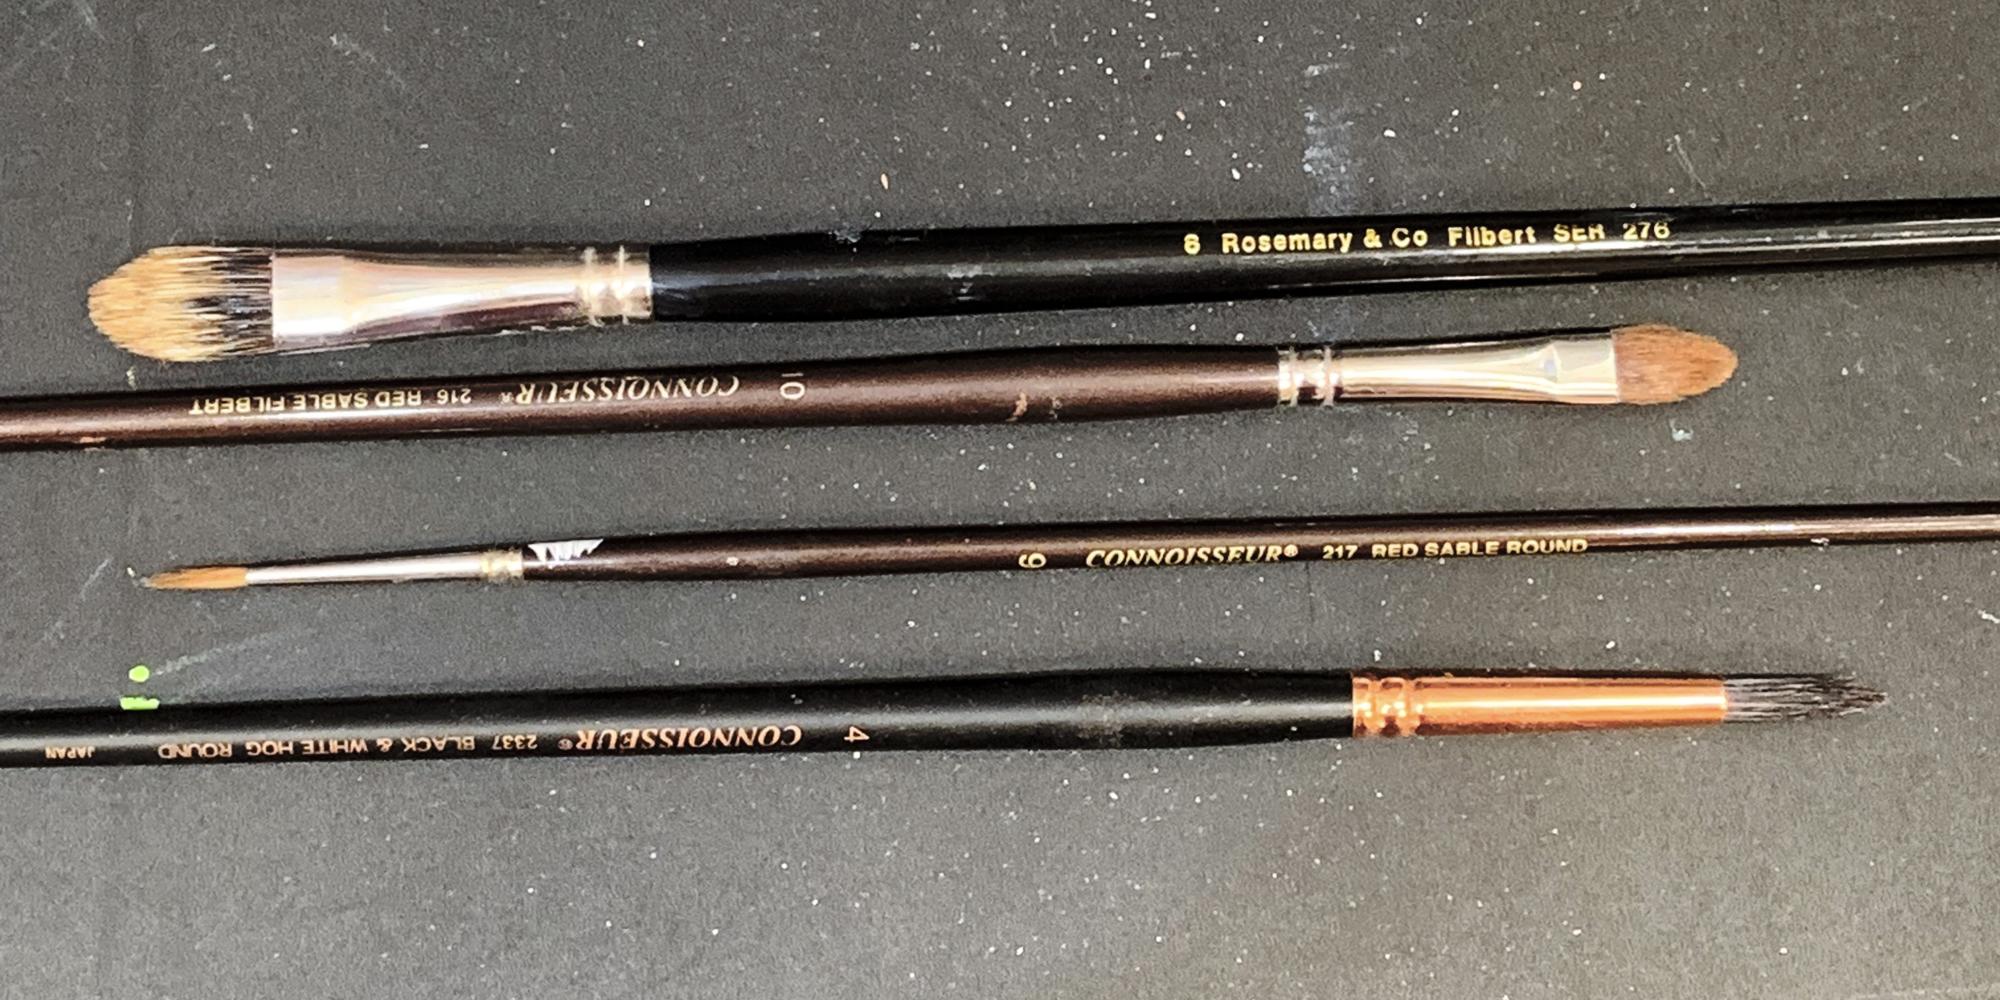 Connoisseur No.6 Round Hog Bristle Long Handle Brush Black and White